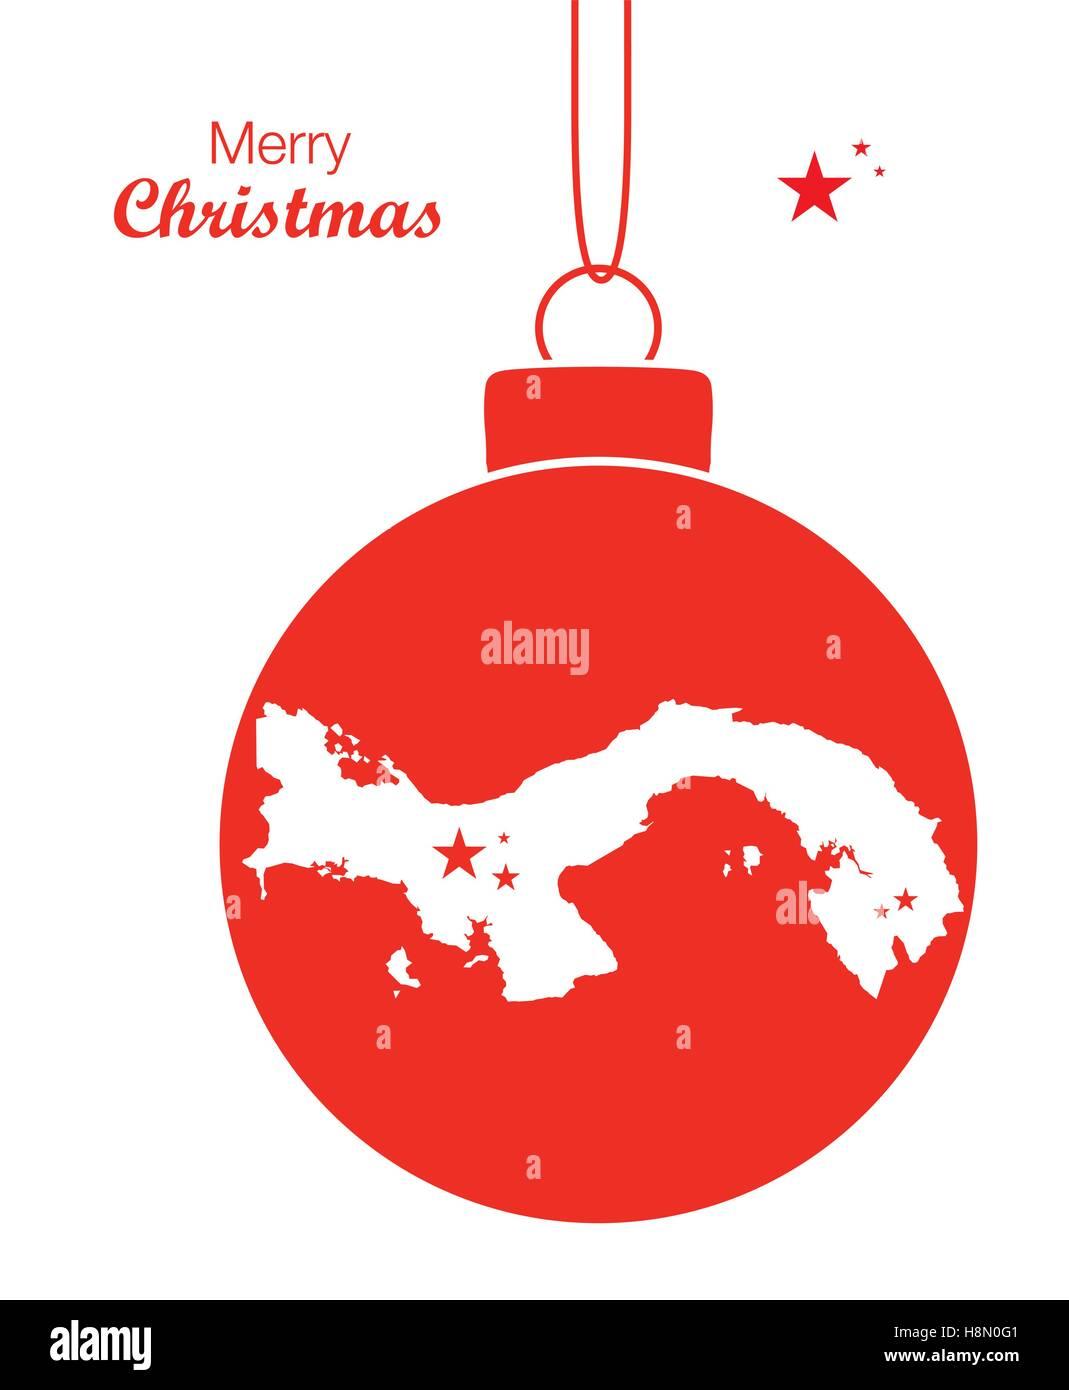 Merry Christmas Map Panama Stock Vector Art Illustration Vector - Panama map vector